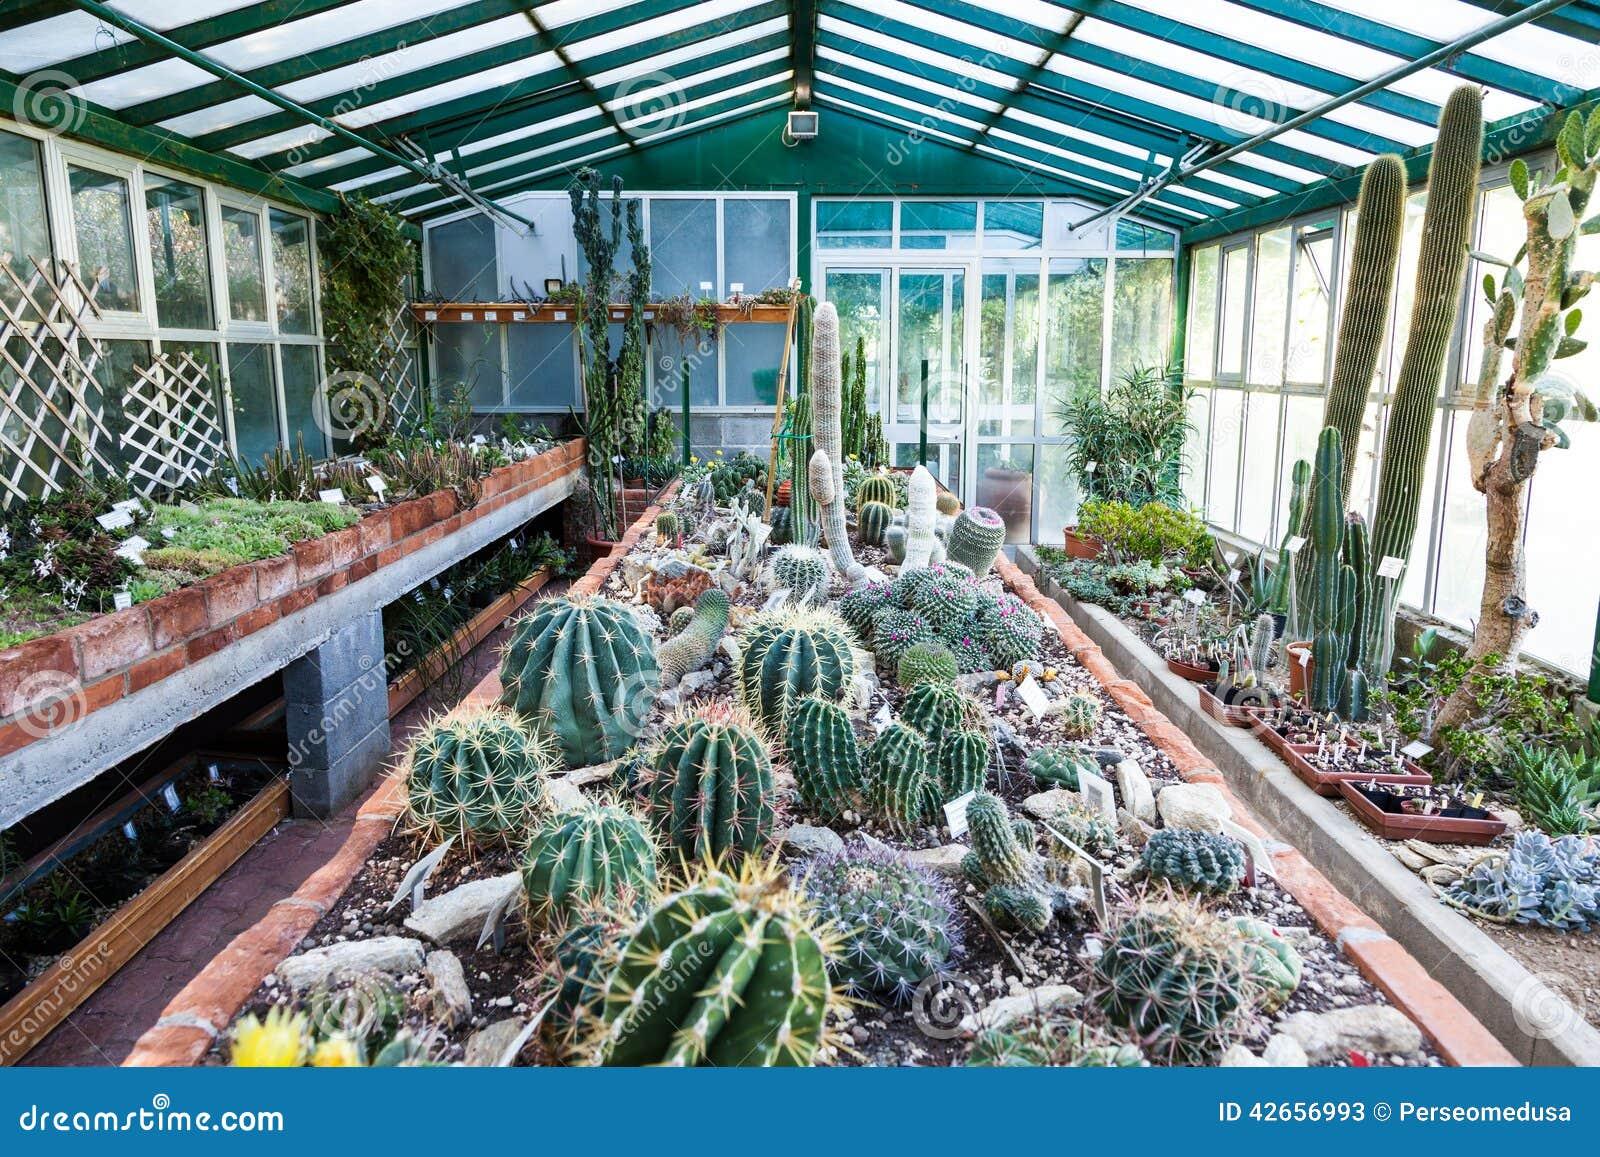 serre chaude de cactus photo stock image 42656993. Black Bedroom Furniture Sets. Home Design Ideas